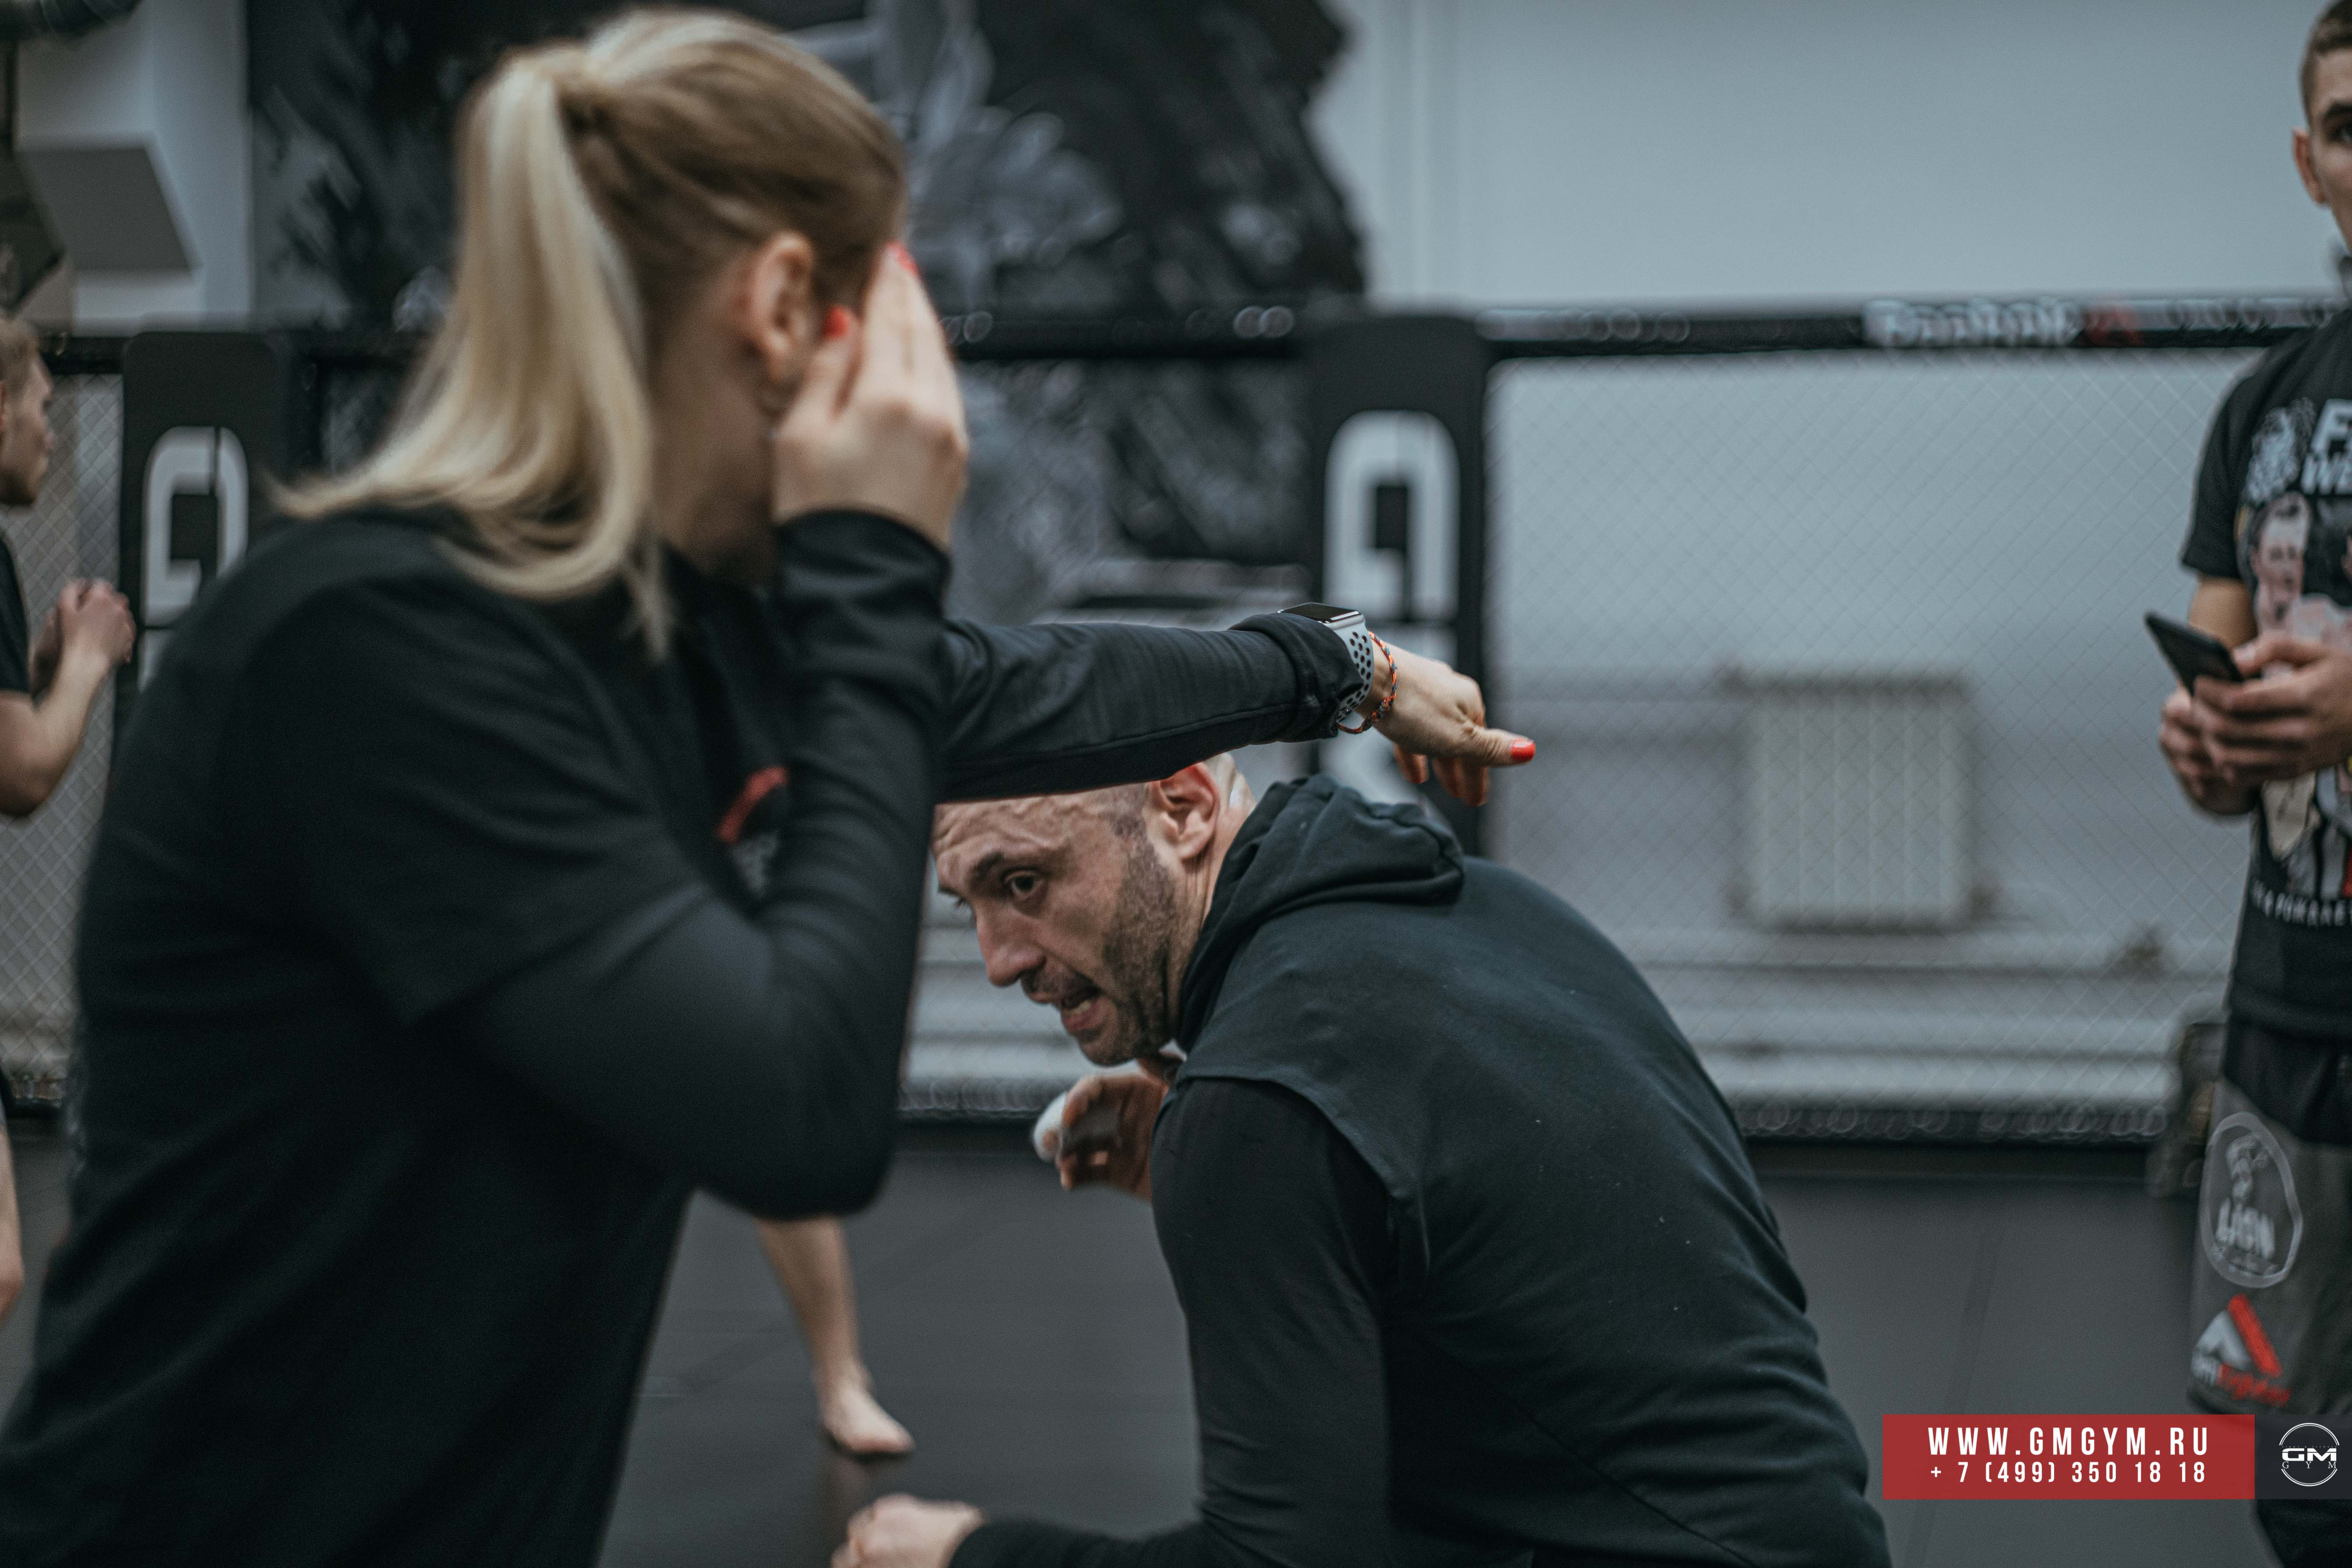 Виталий Слипенко тренер по ММА 6